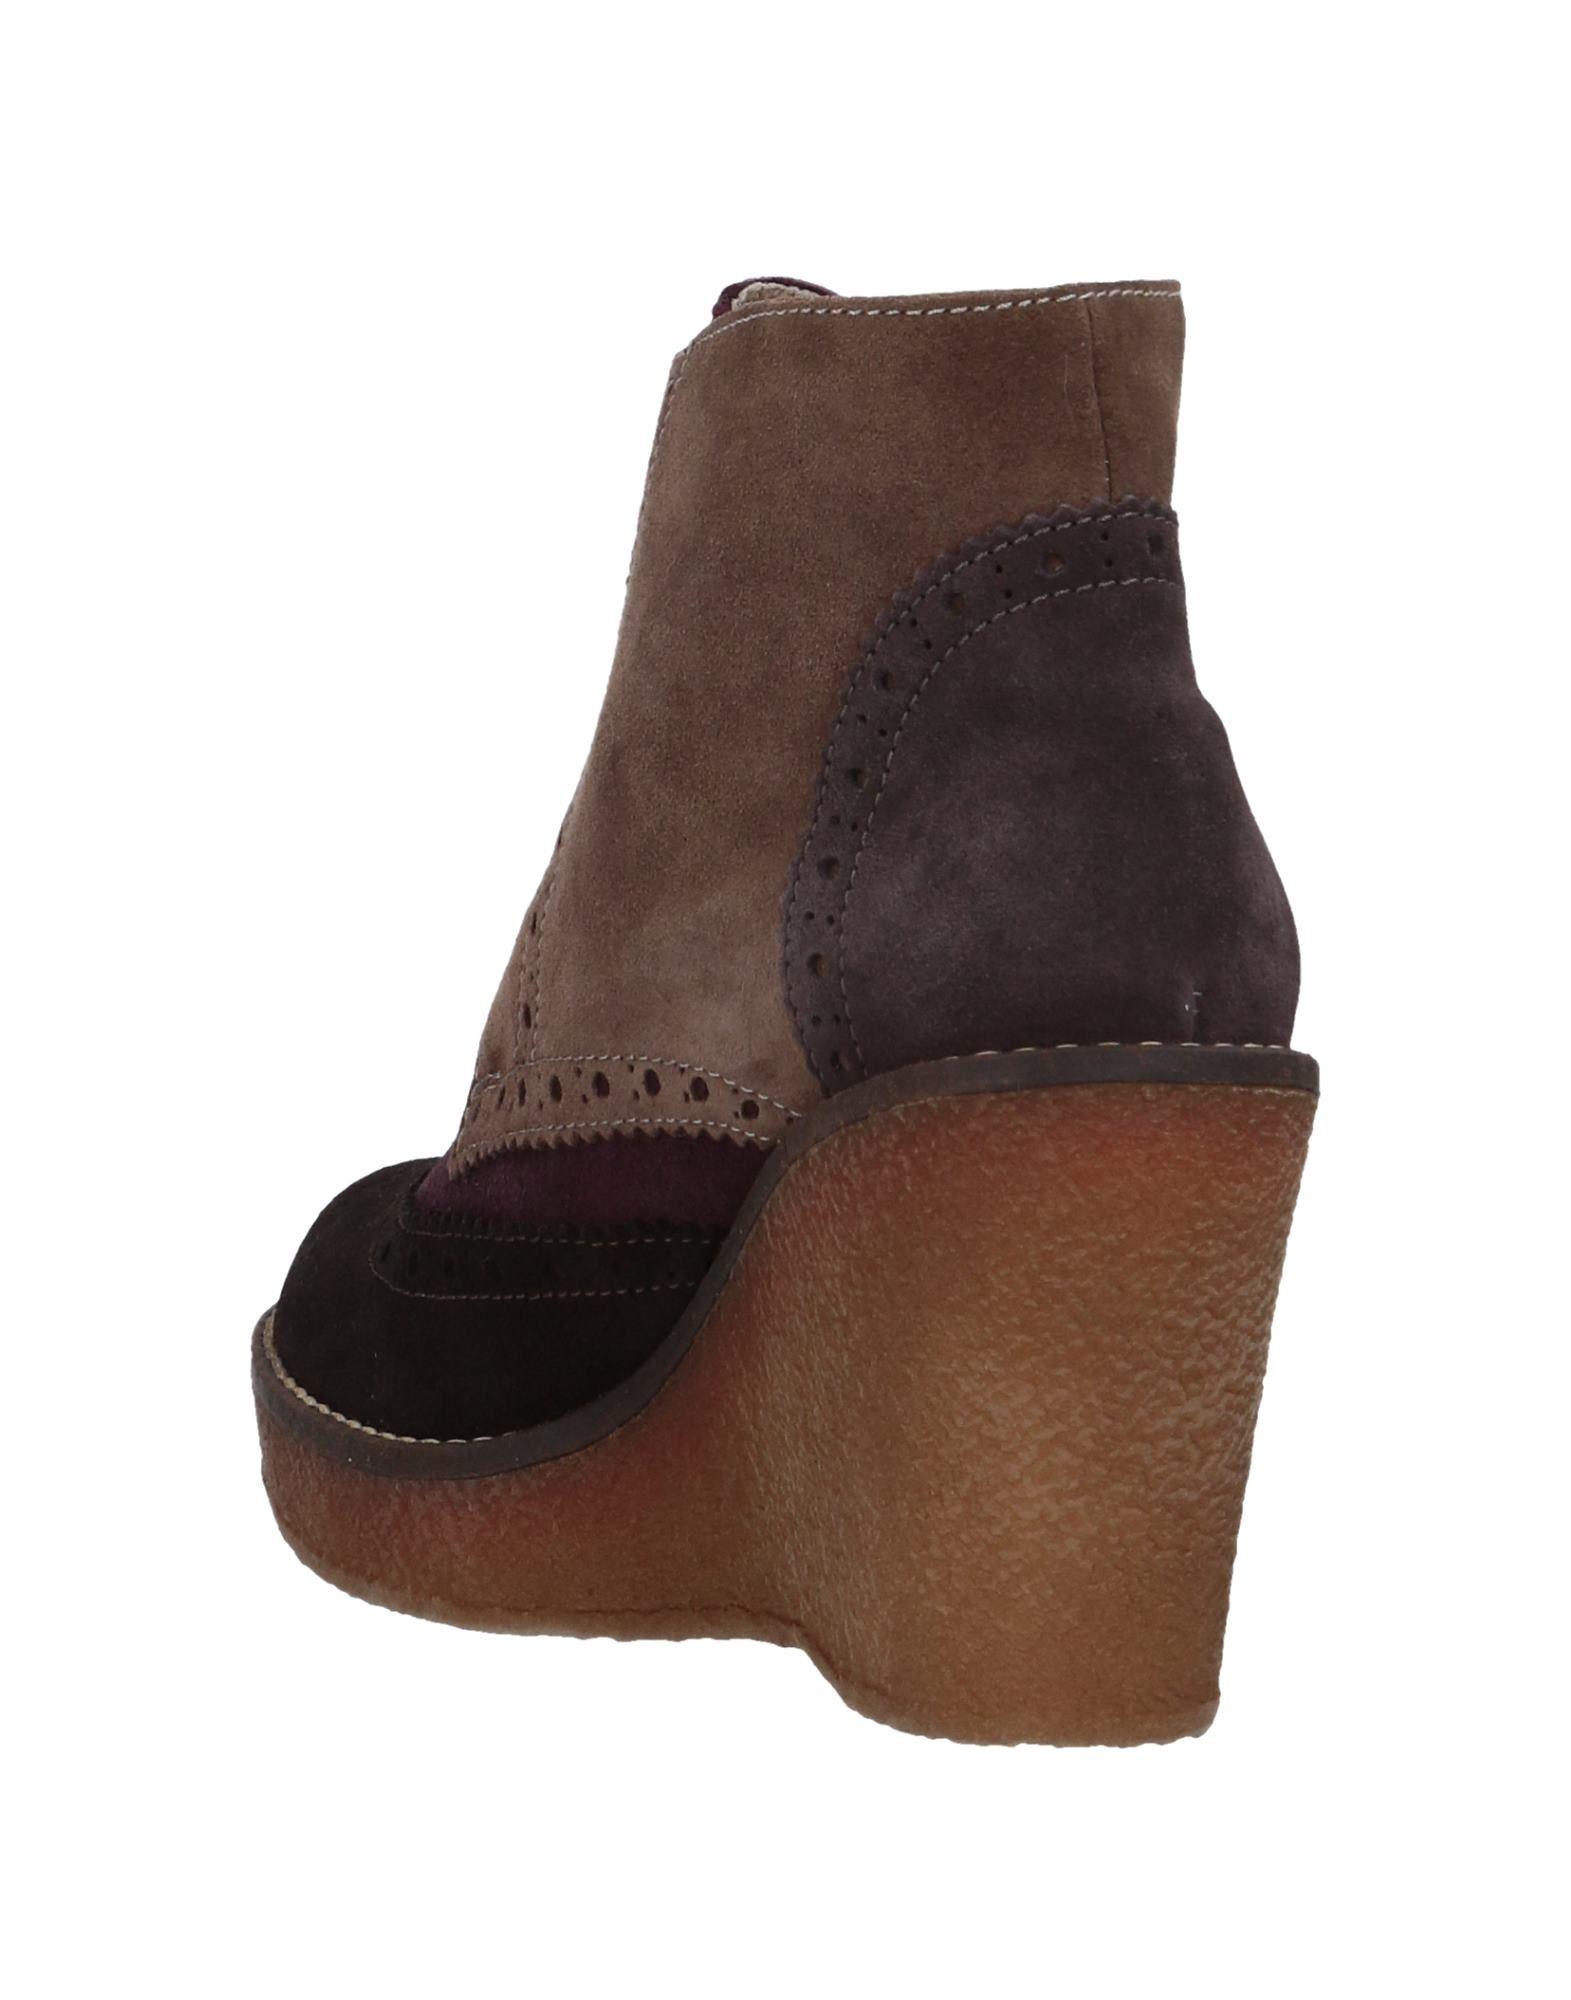 Gut um Etoile billige Schuhe zu tragenSerafini Etoile um Stiefelette Damen  11531544OV 2c8676